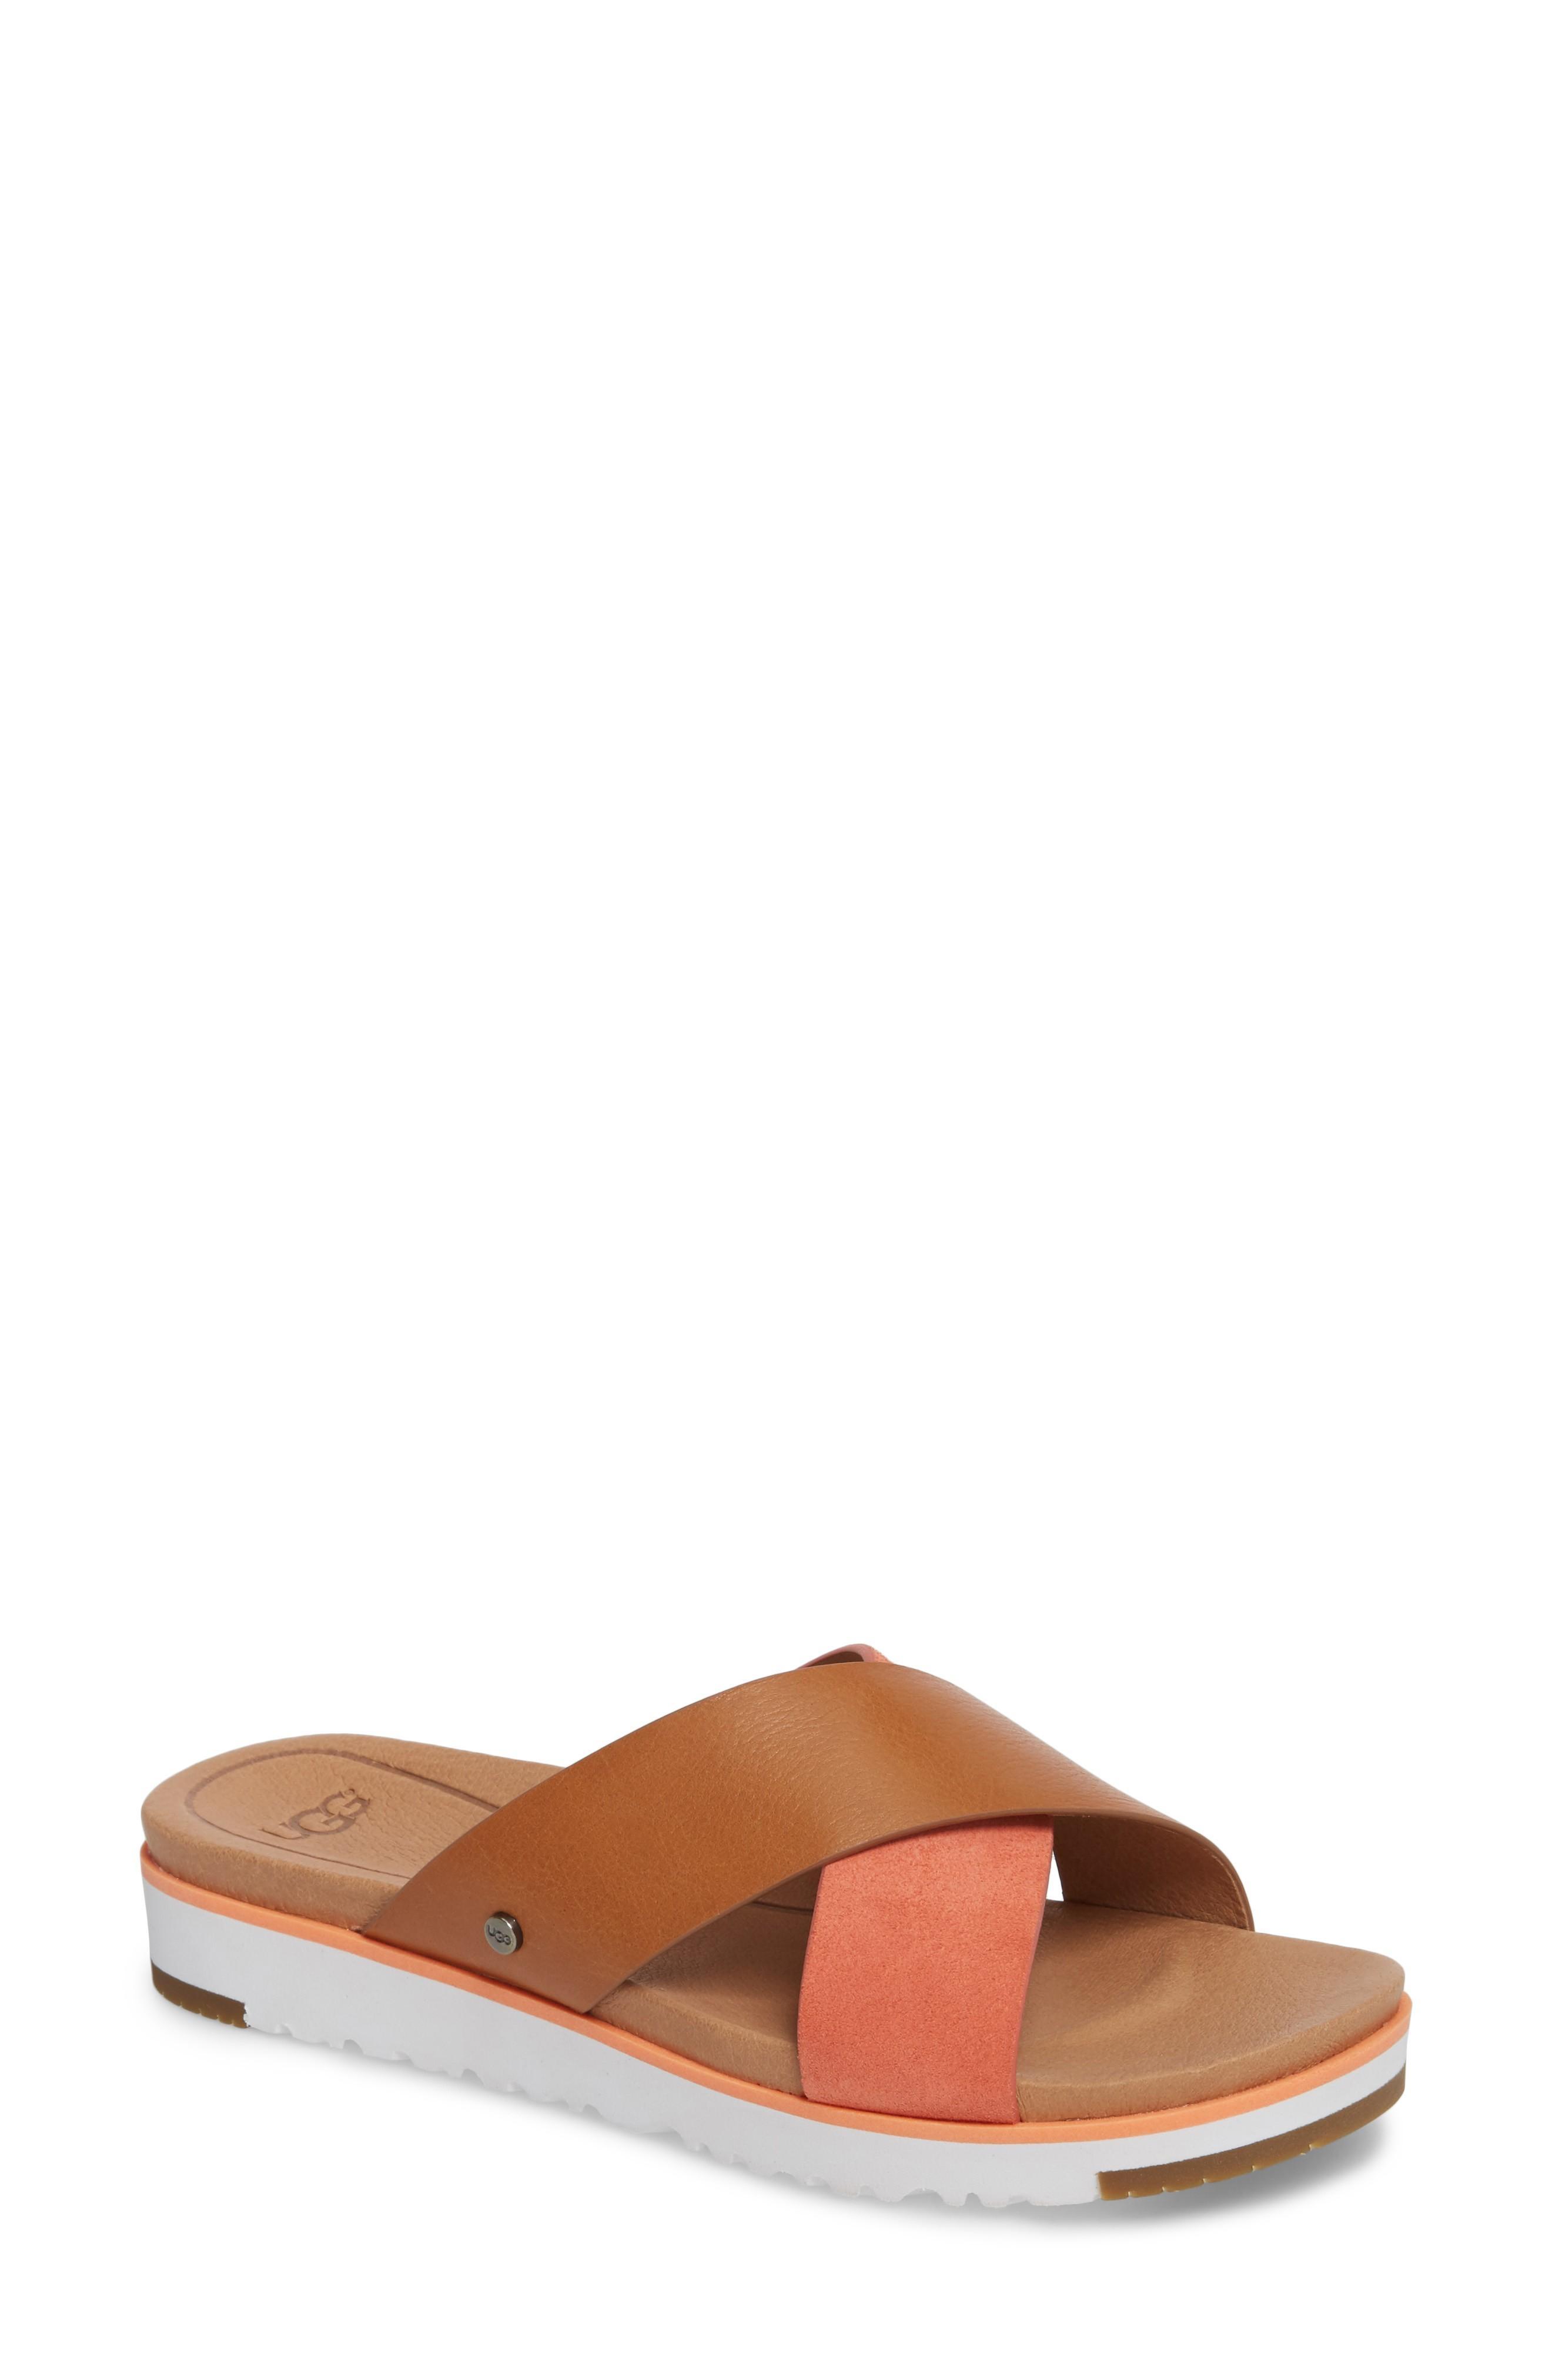 954f0c1fc57 Ugg 'Kari' Sandal in Fusion Coral Leather